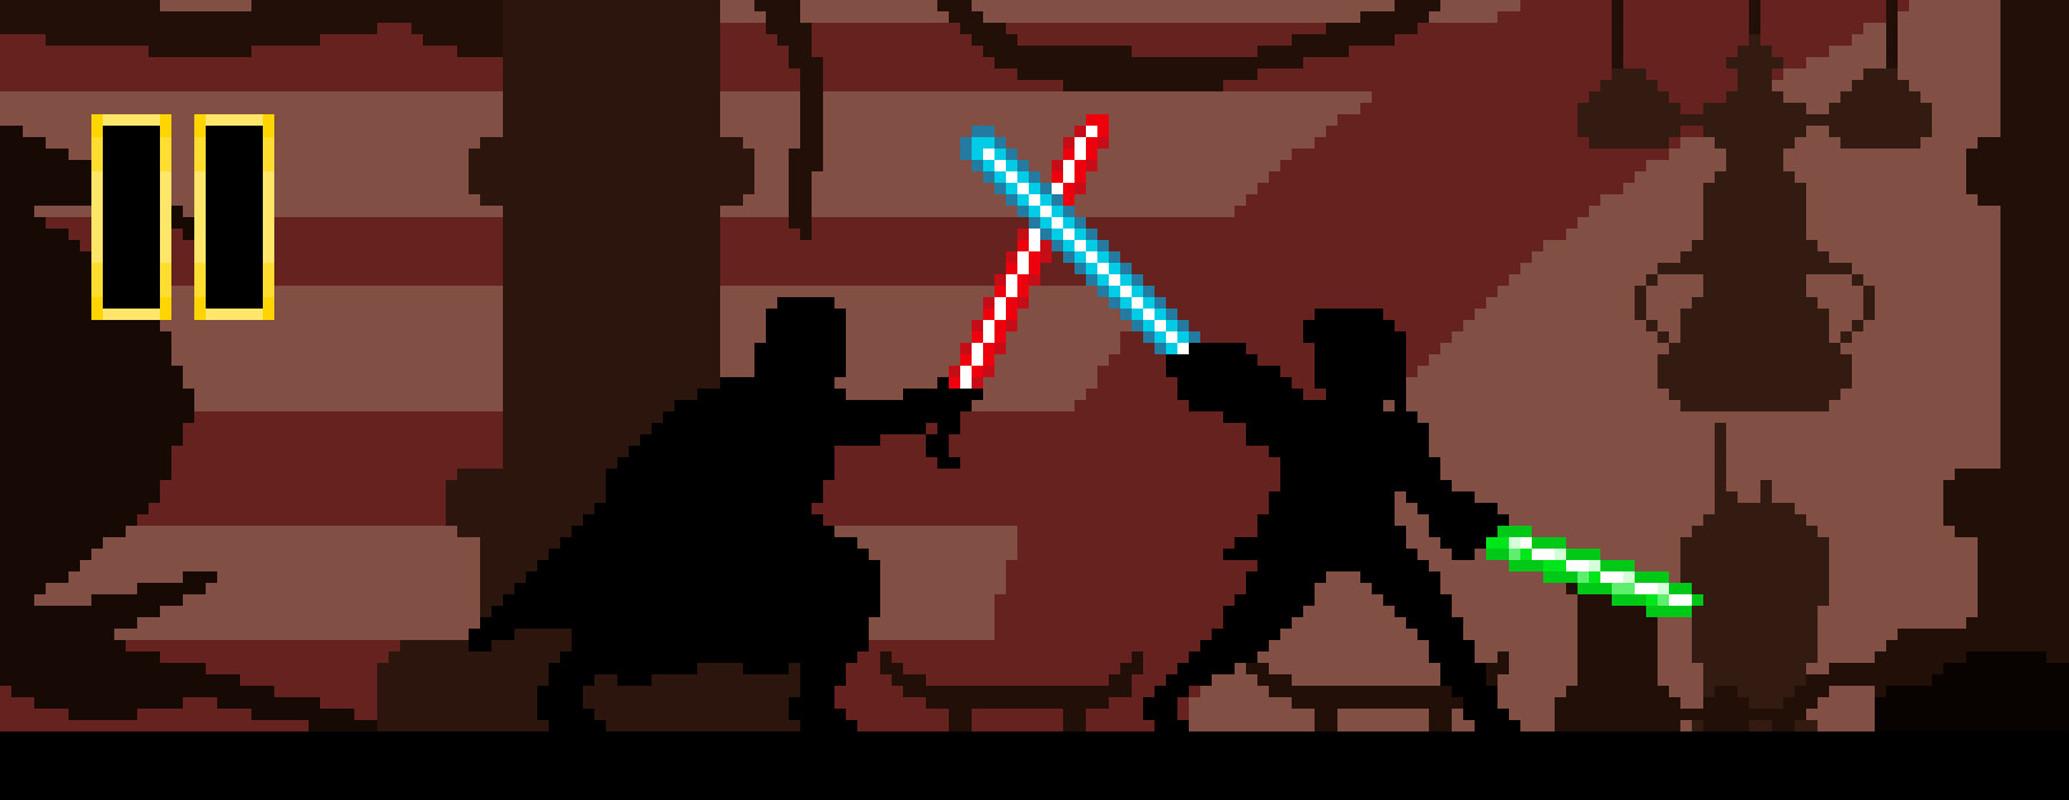 Wallpaper Star Wars Episode Ii Attack Of The Clones Star Wars